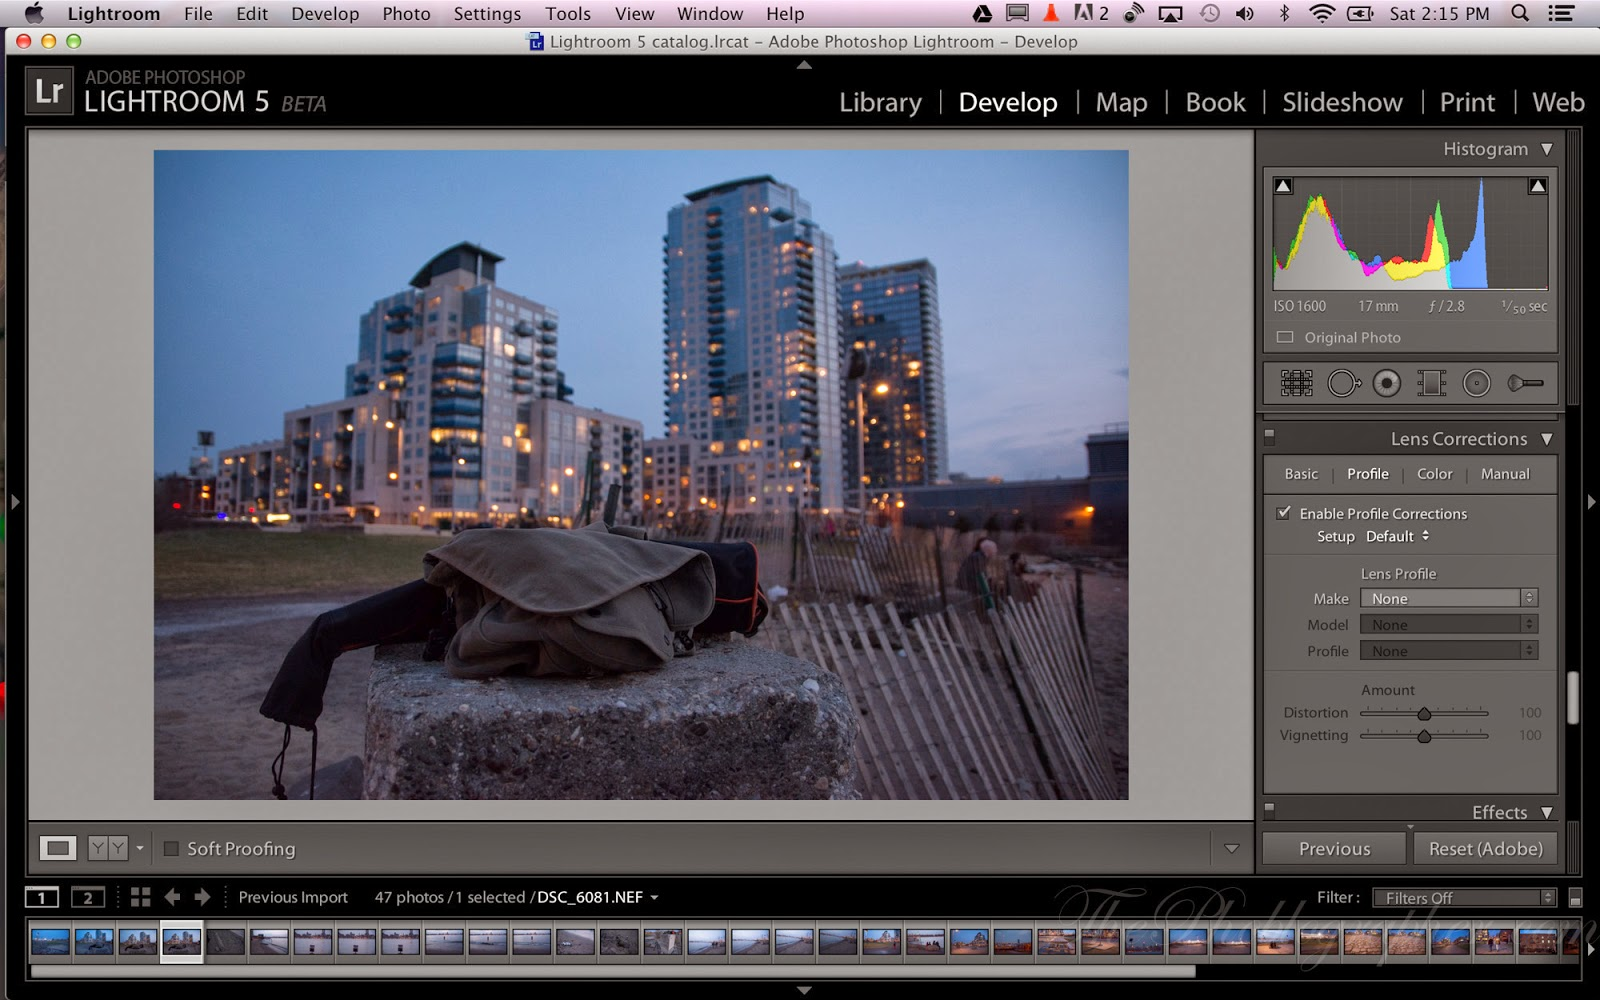 Adobe Photoshop 7.0 Free Download [Updated 2019] - SoftLinko